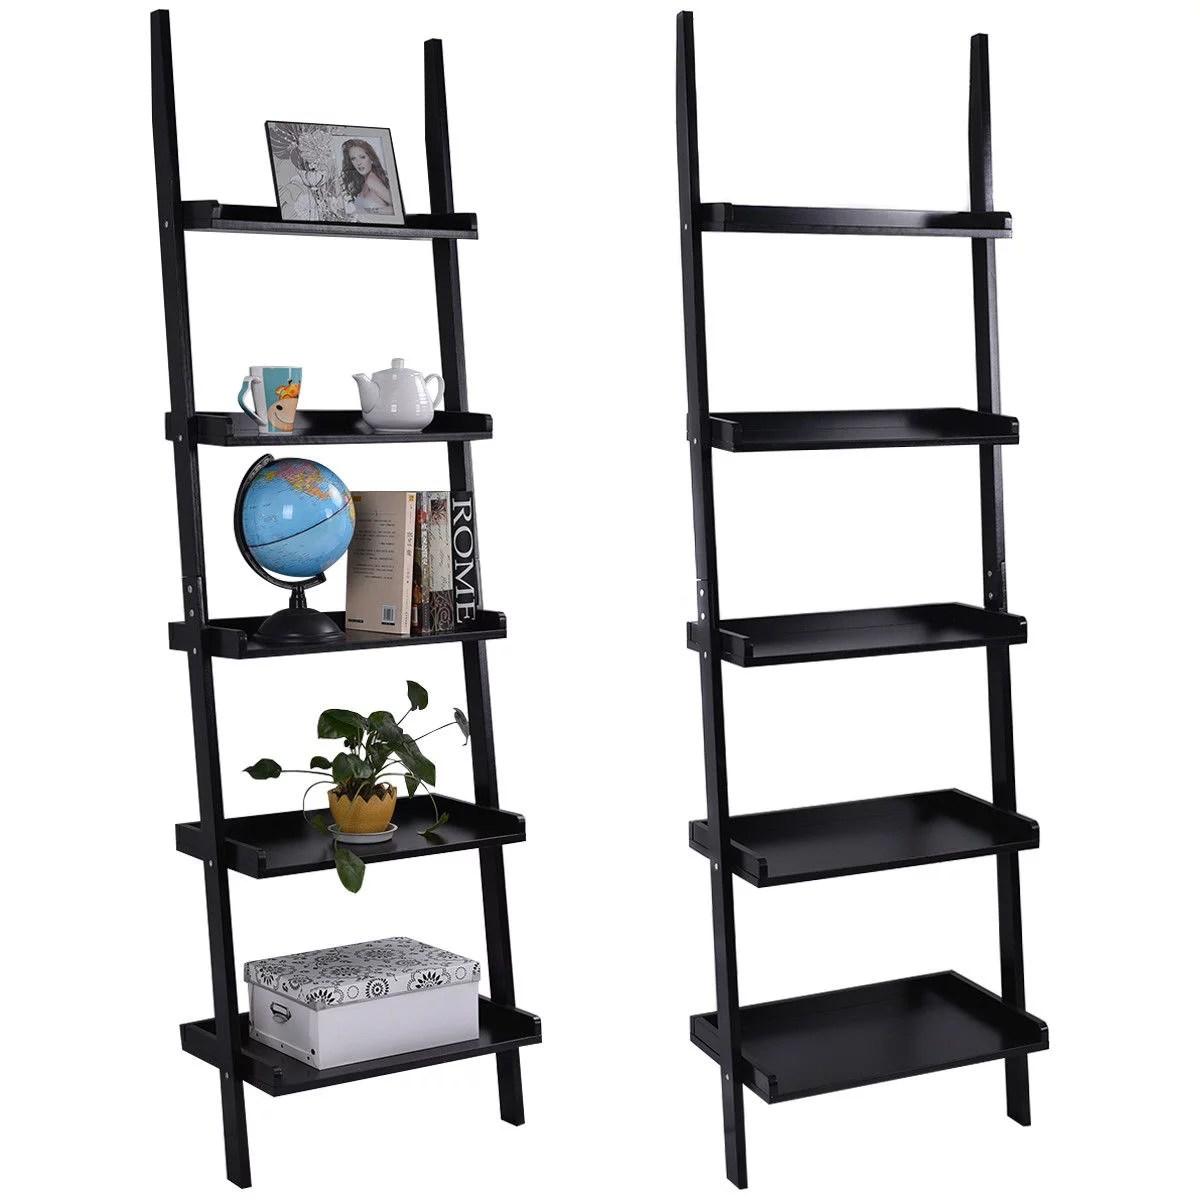 5 Tier Bookshelf Leaning Wall Shelf Ladder Bookcase Storage Display Stand